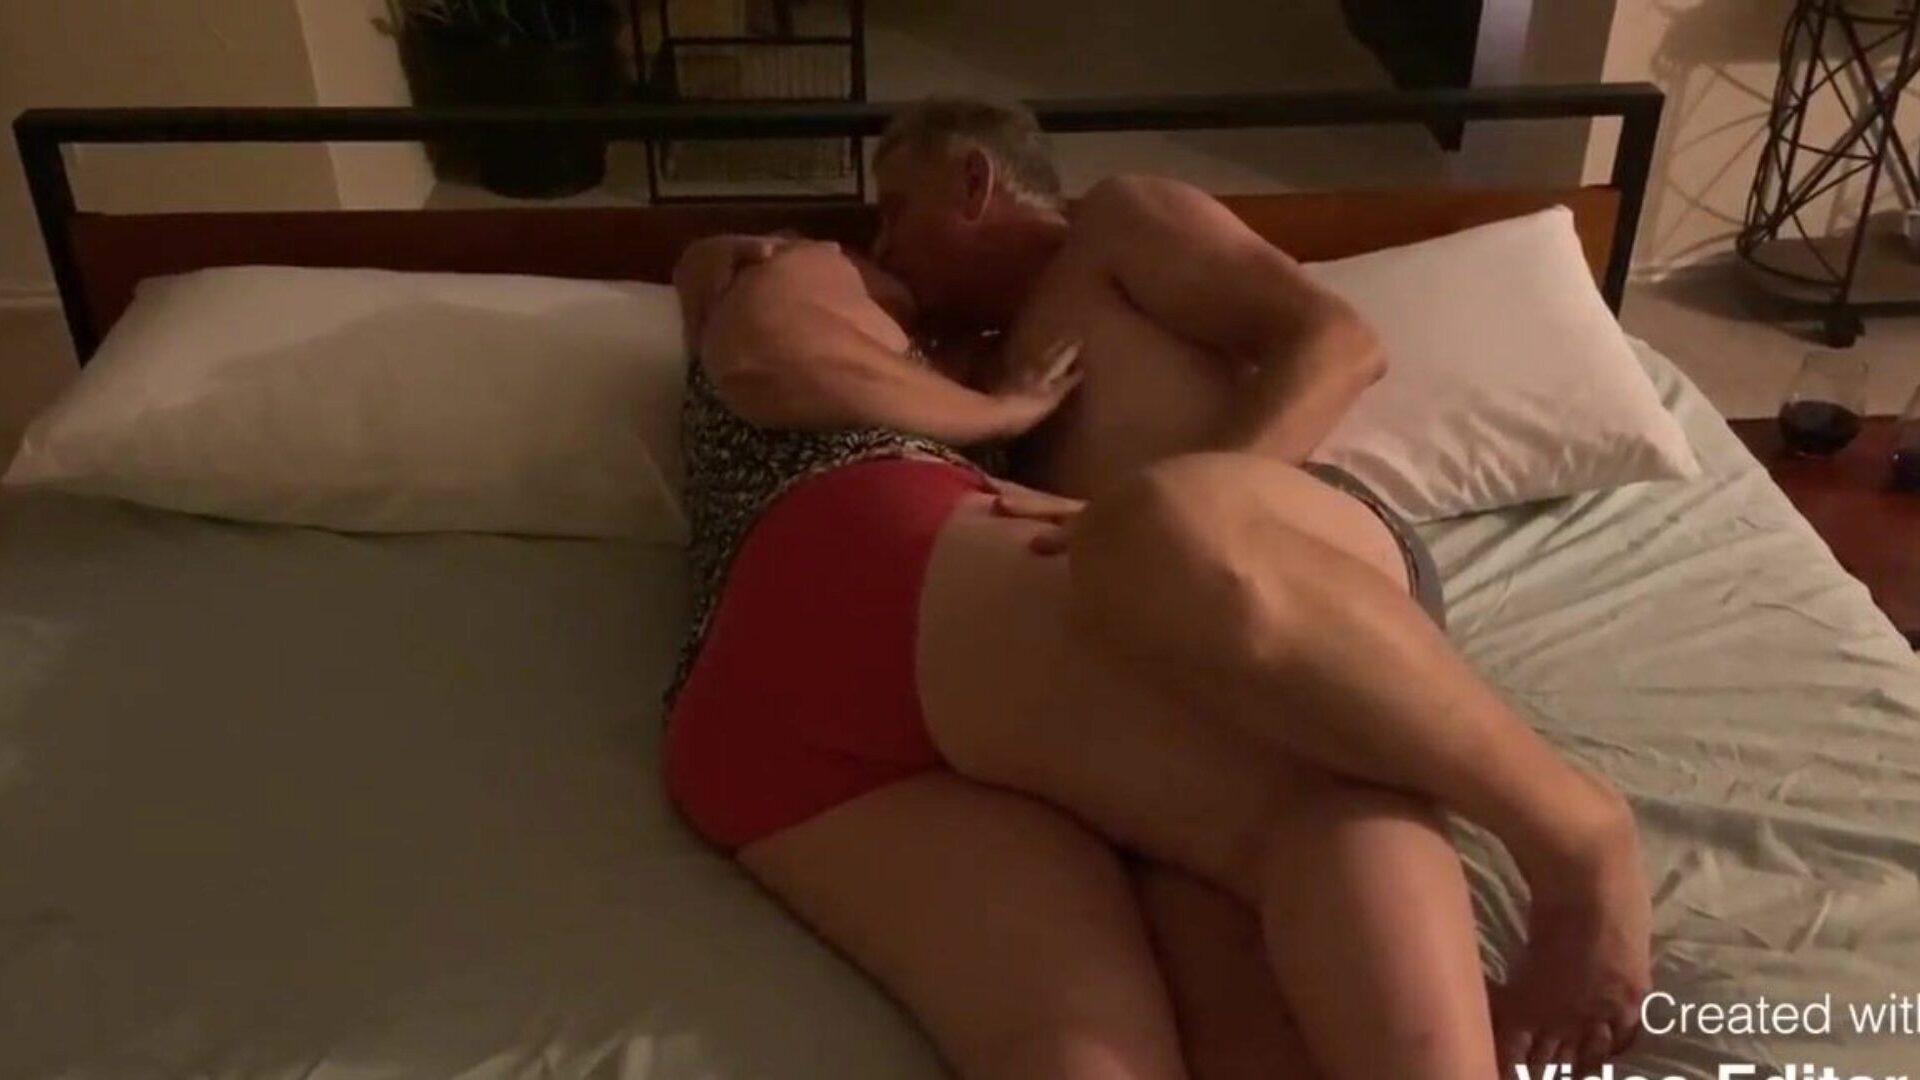 Porn vids beeg i-um.net >